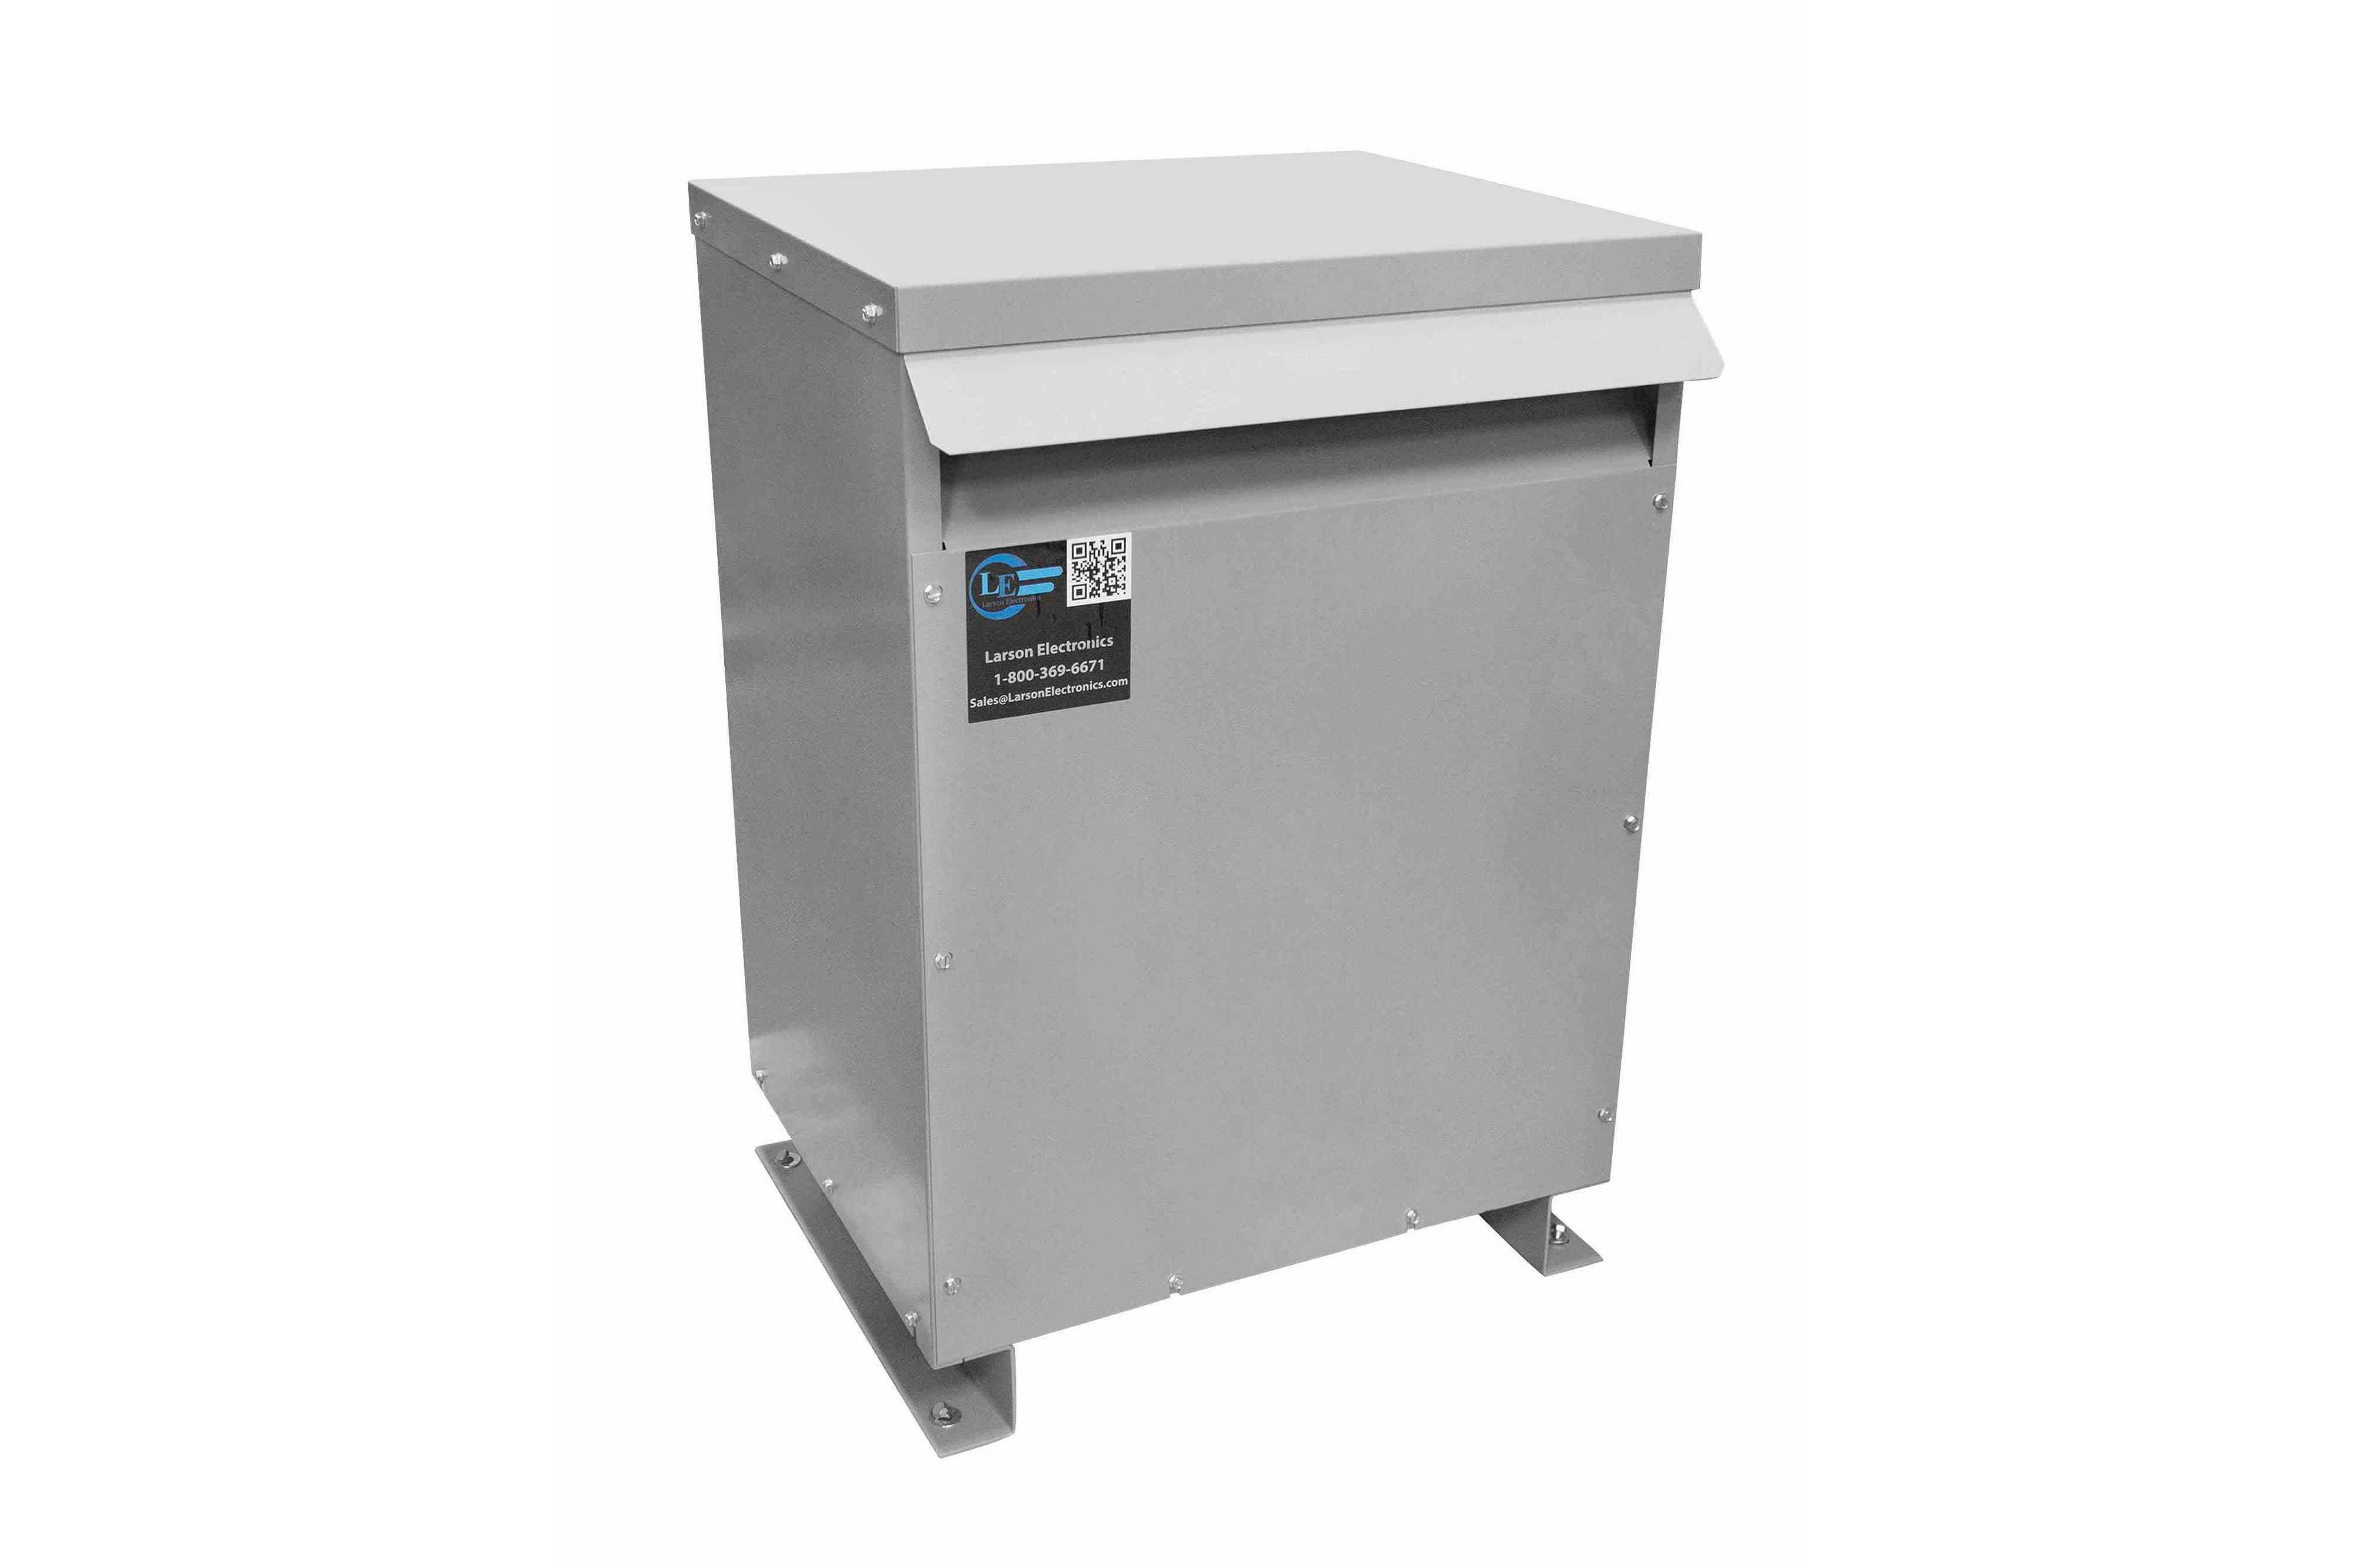 700 kVA 3PH Isolation Transformer, 575V Wye Primary, 480V Delta Secondary, N3R, Ventilated, 60 Hz